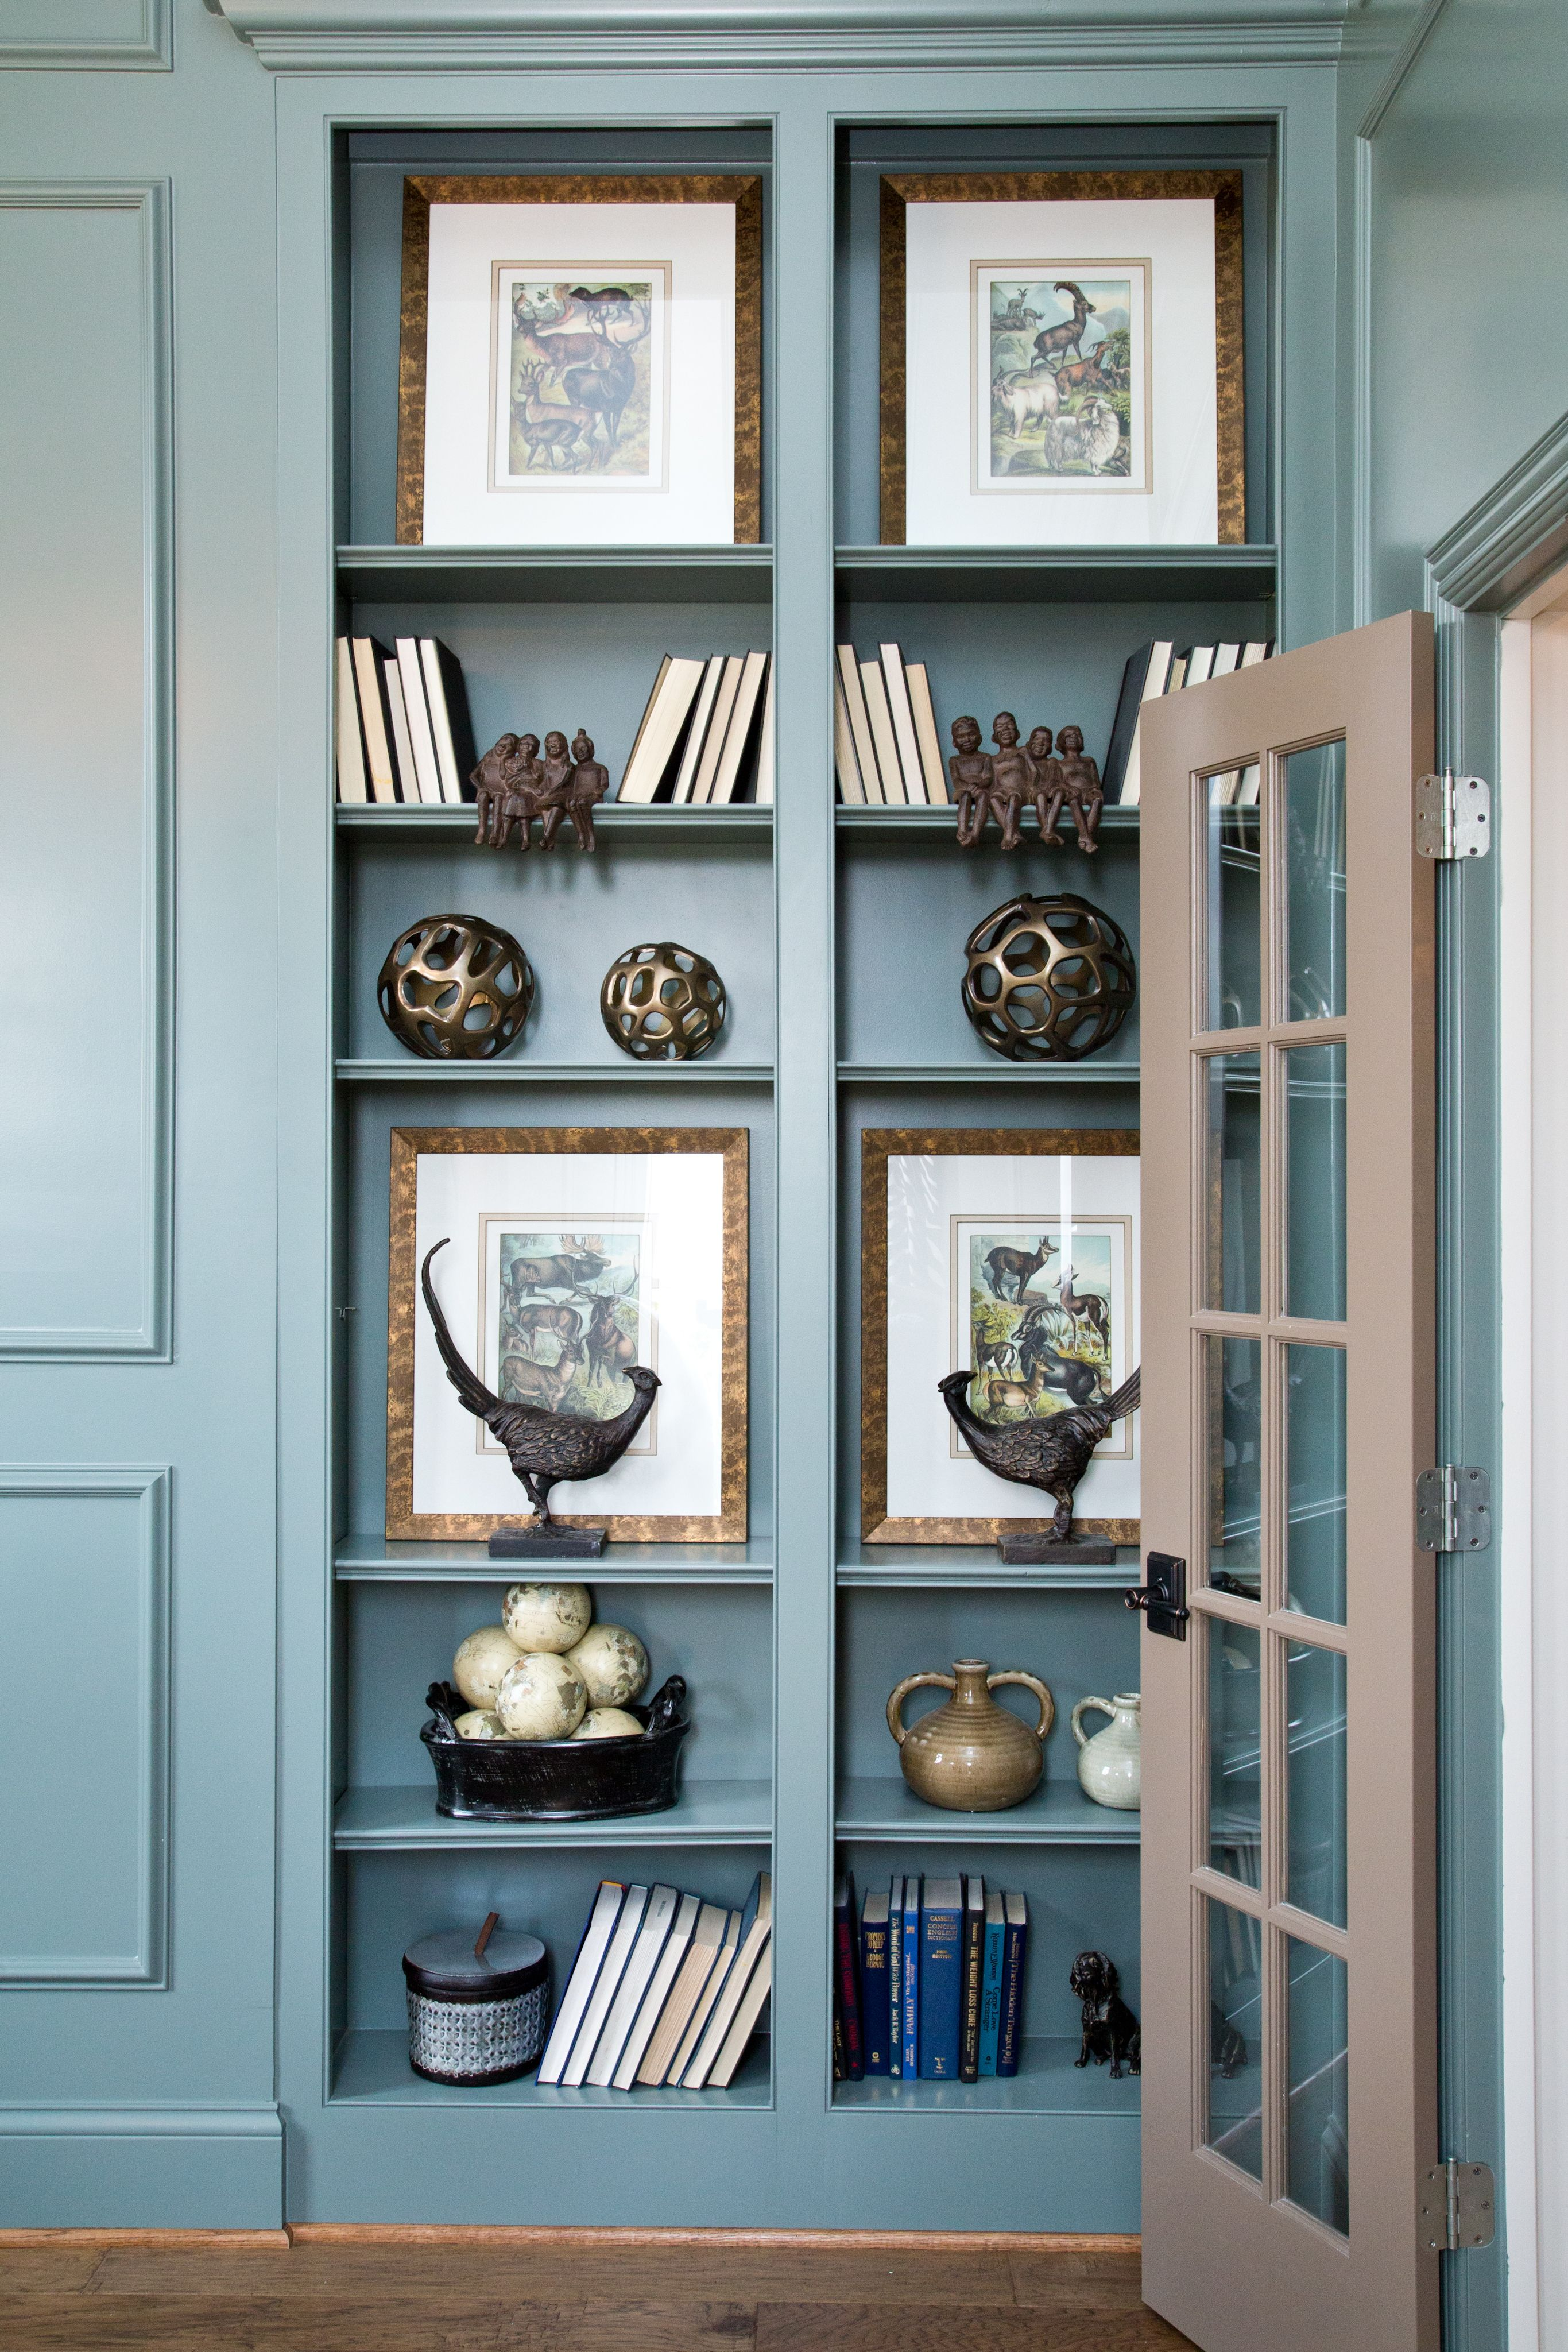 pinterest painted bookshelves likewise - photo #13